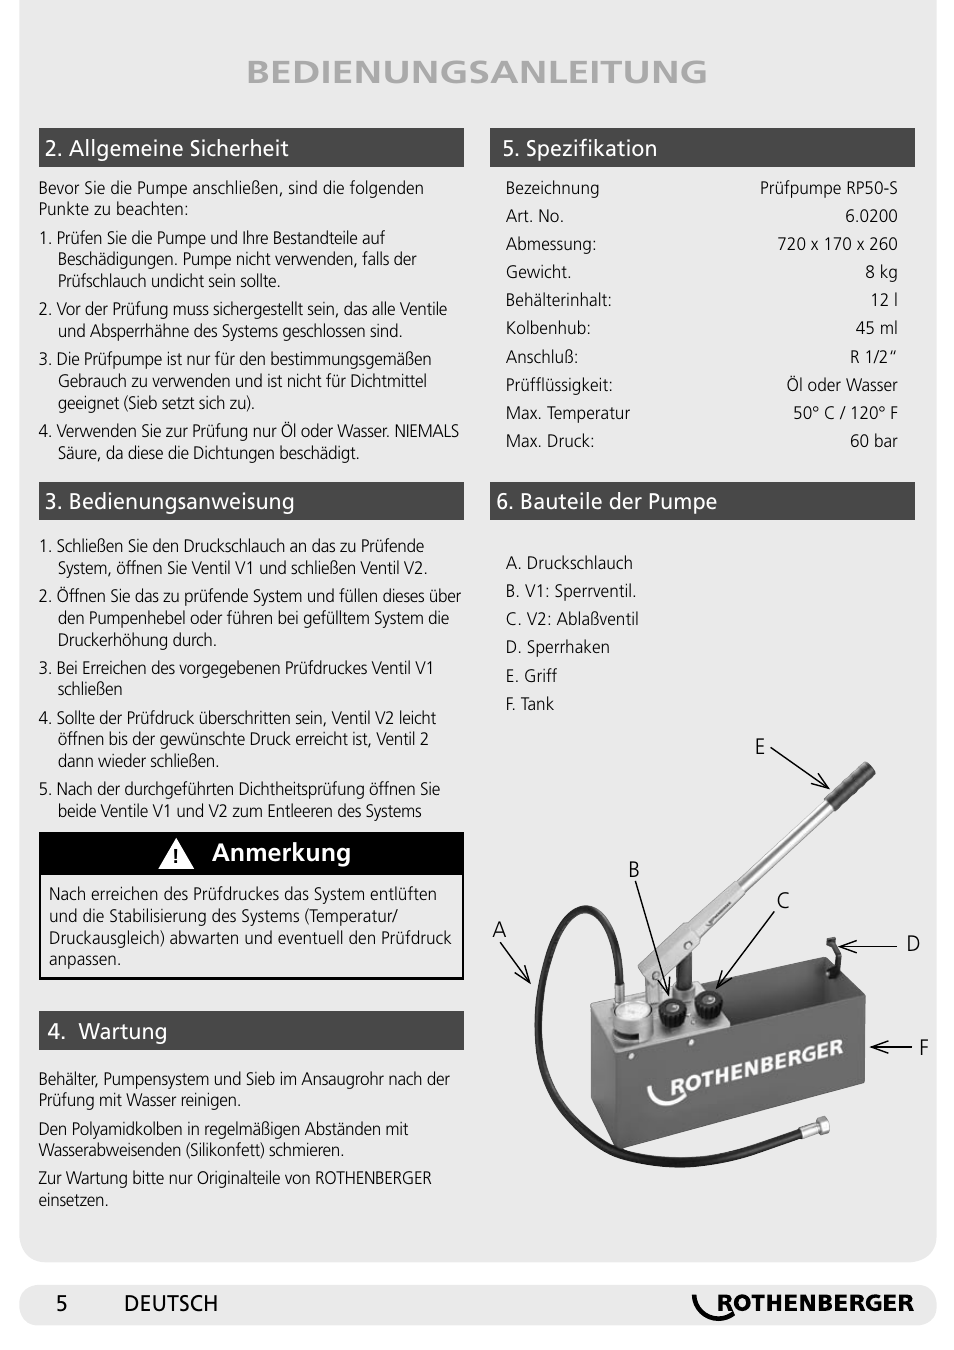 bedienungsanleitung anmerkung rothenberger rp 50 s rp 50 s inox rh manualsdir com user manual smart watch kite bluetooth user manual smart bracelet i5 plus